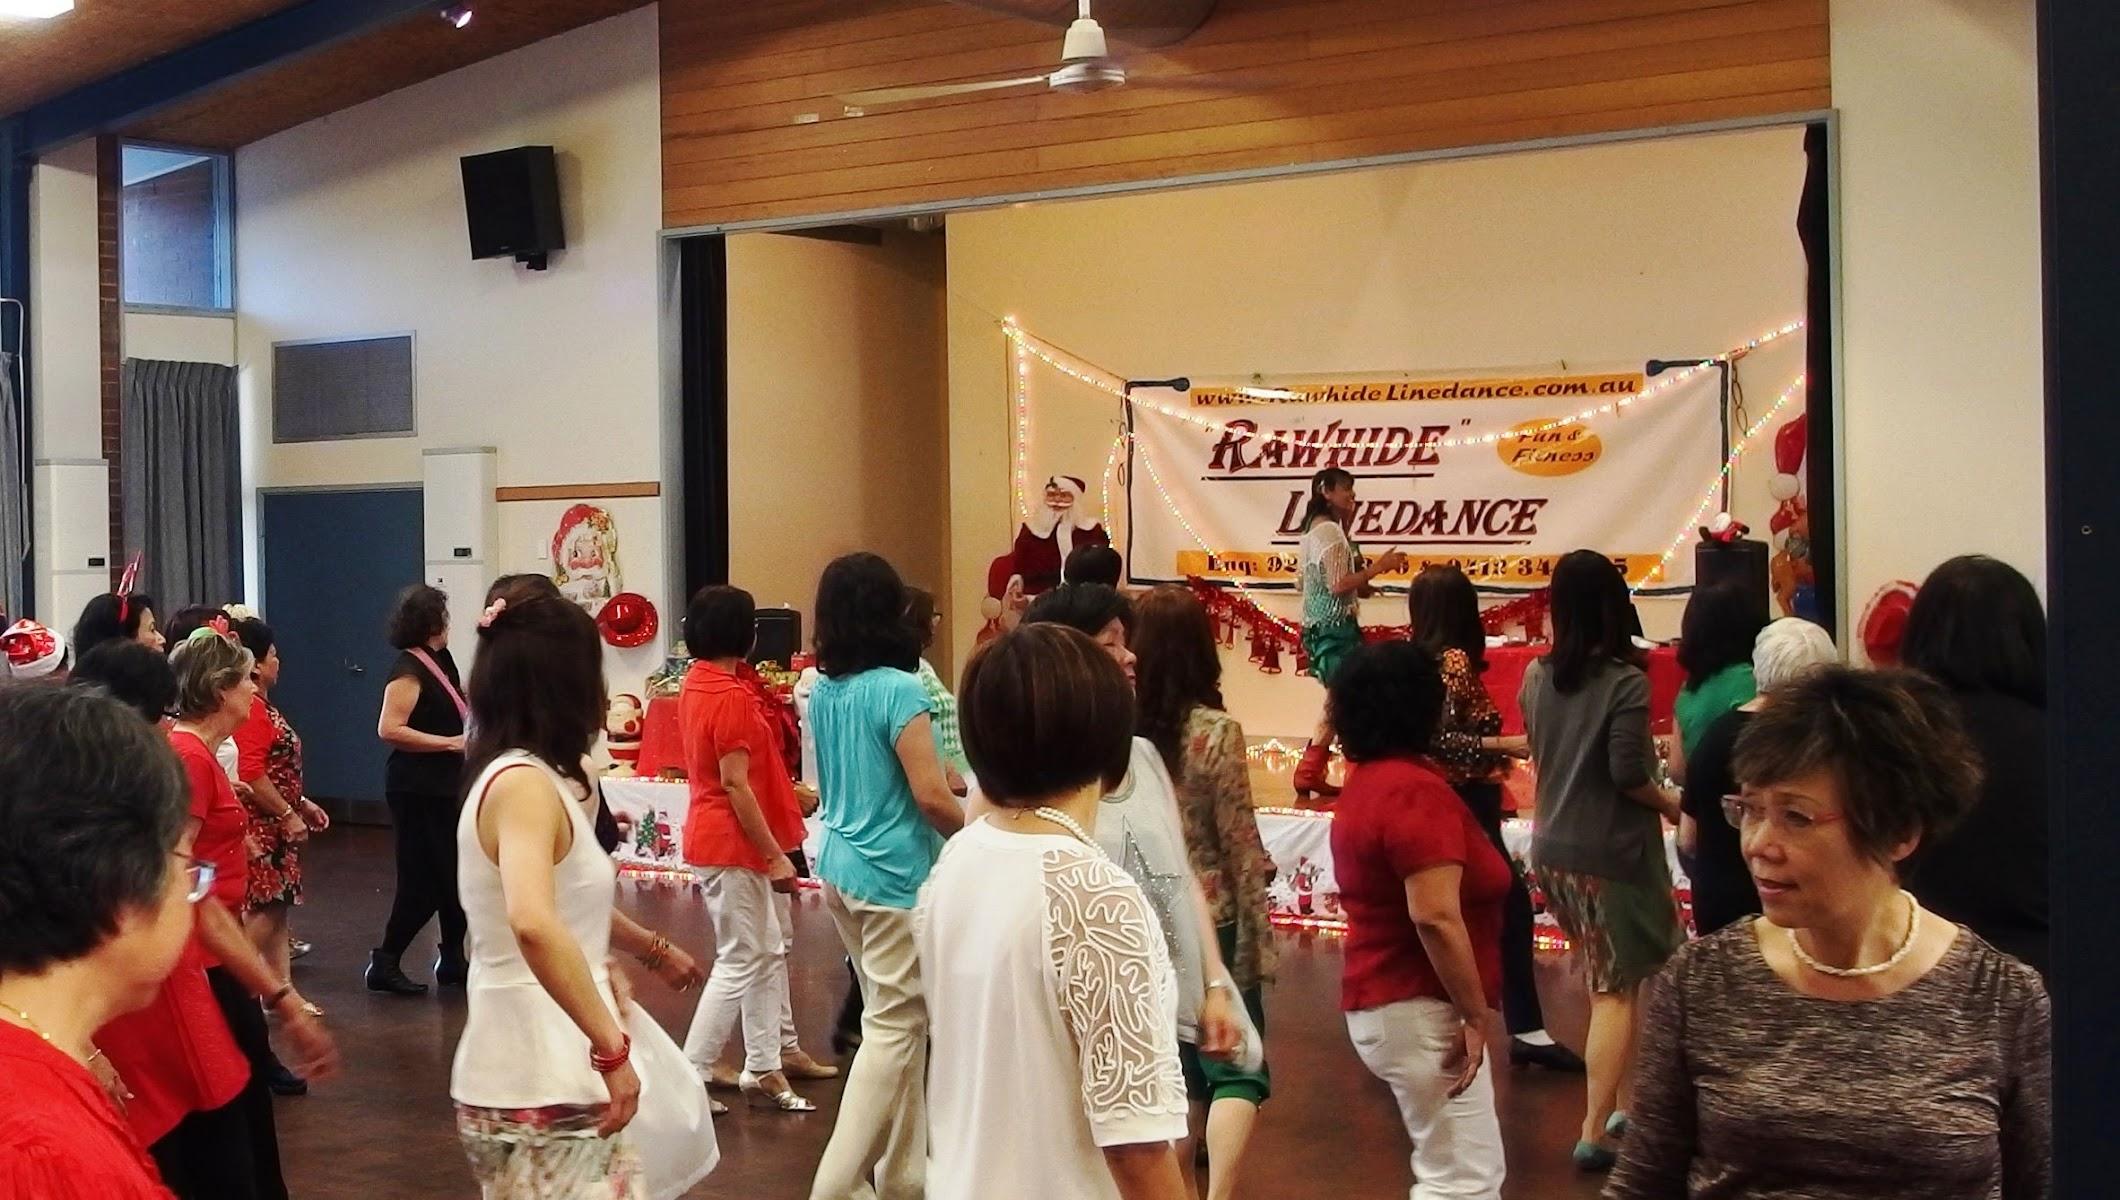 Rawhide Linedance